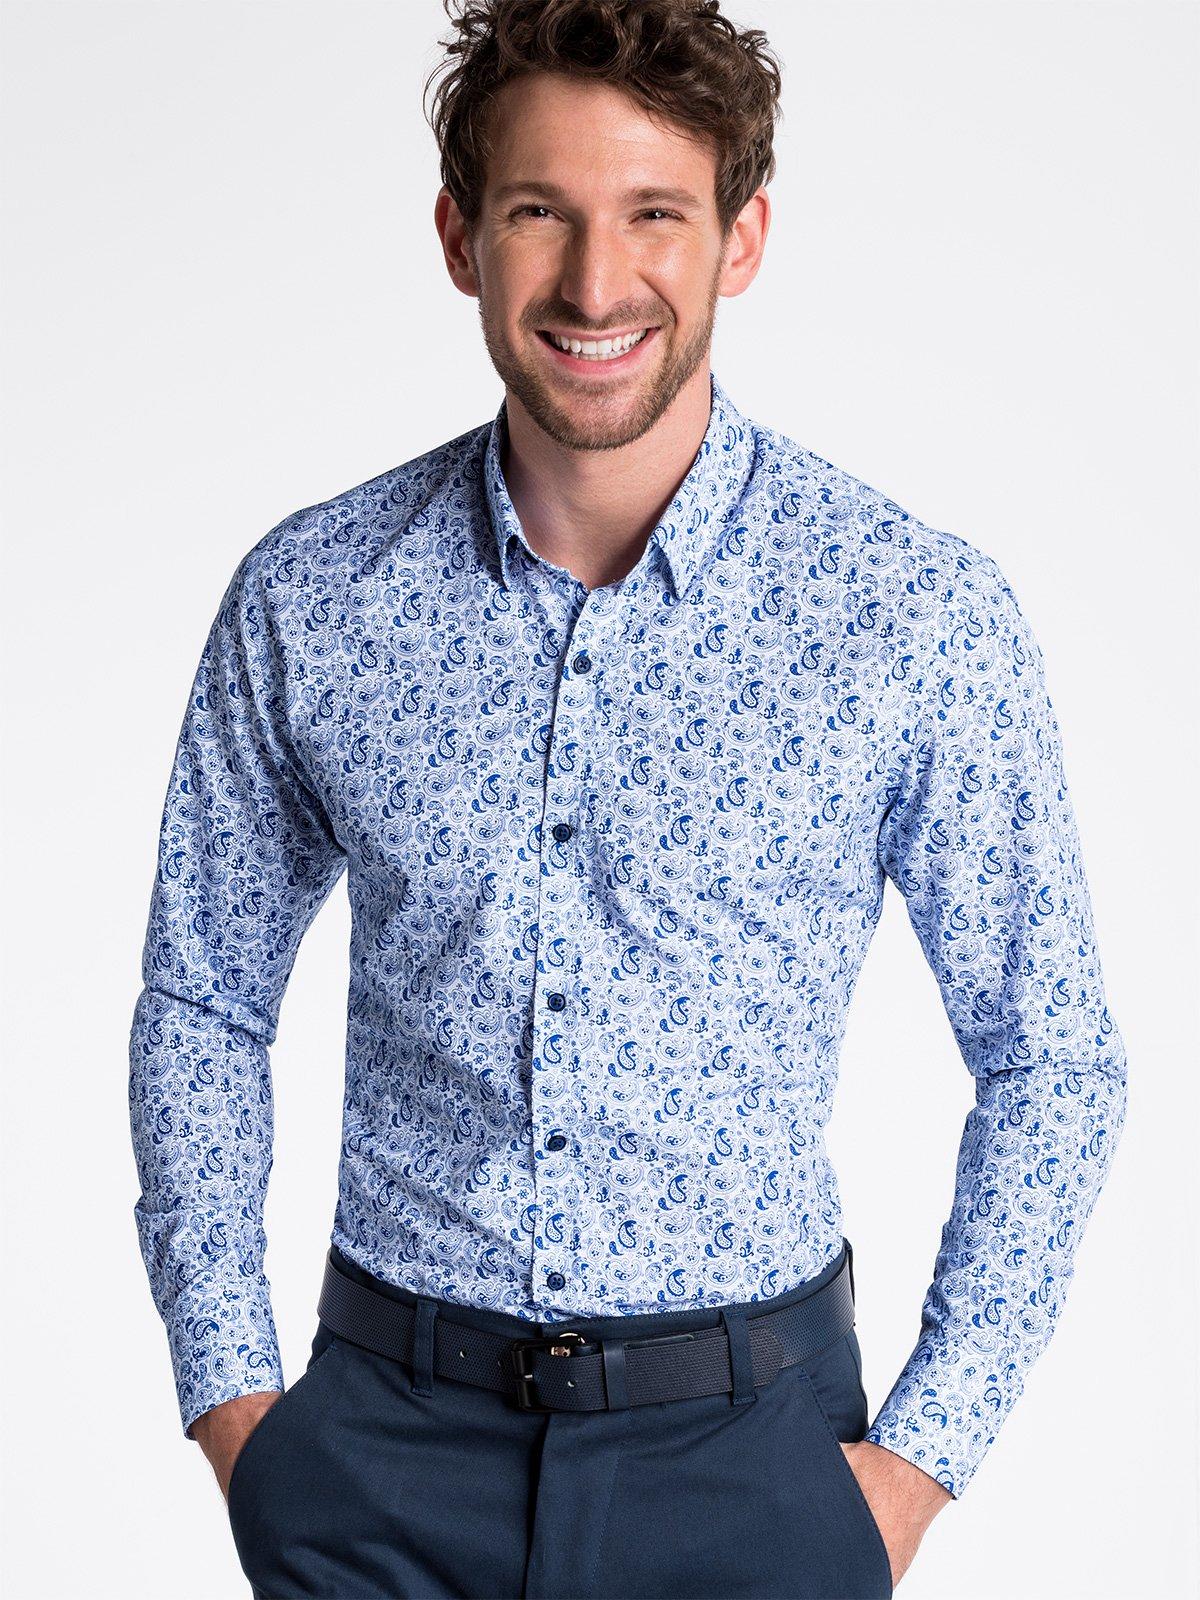 dc6adeb2fb8406 Koszula męska elegancka z długim rękawem K476 - biała/niebieska ...